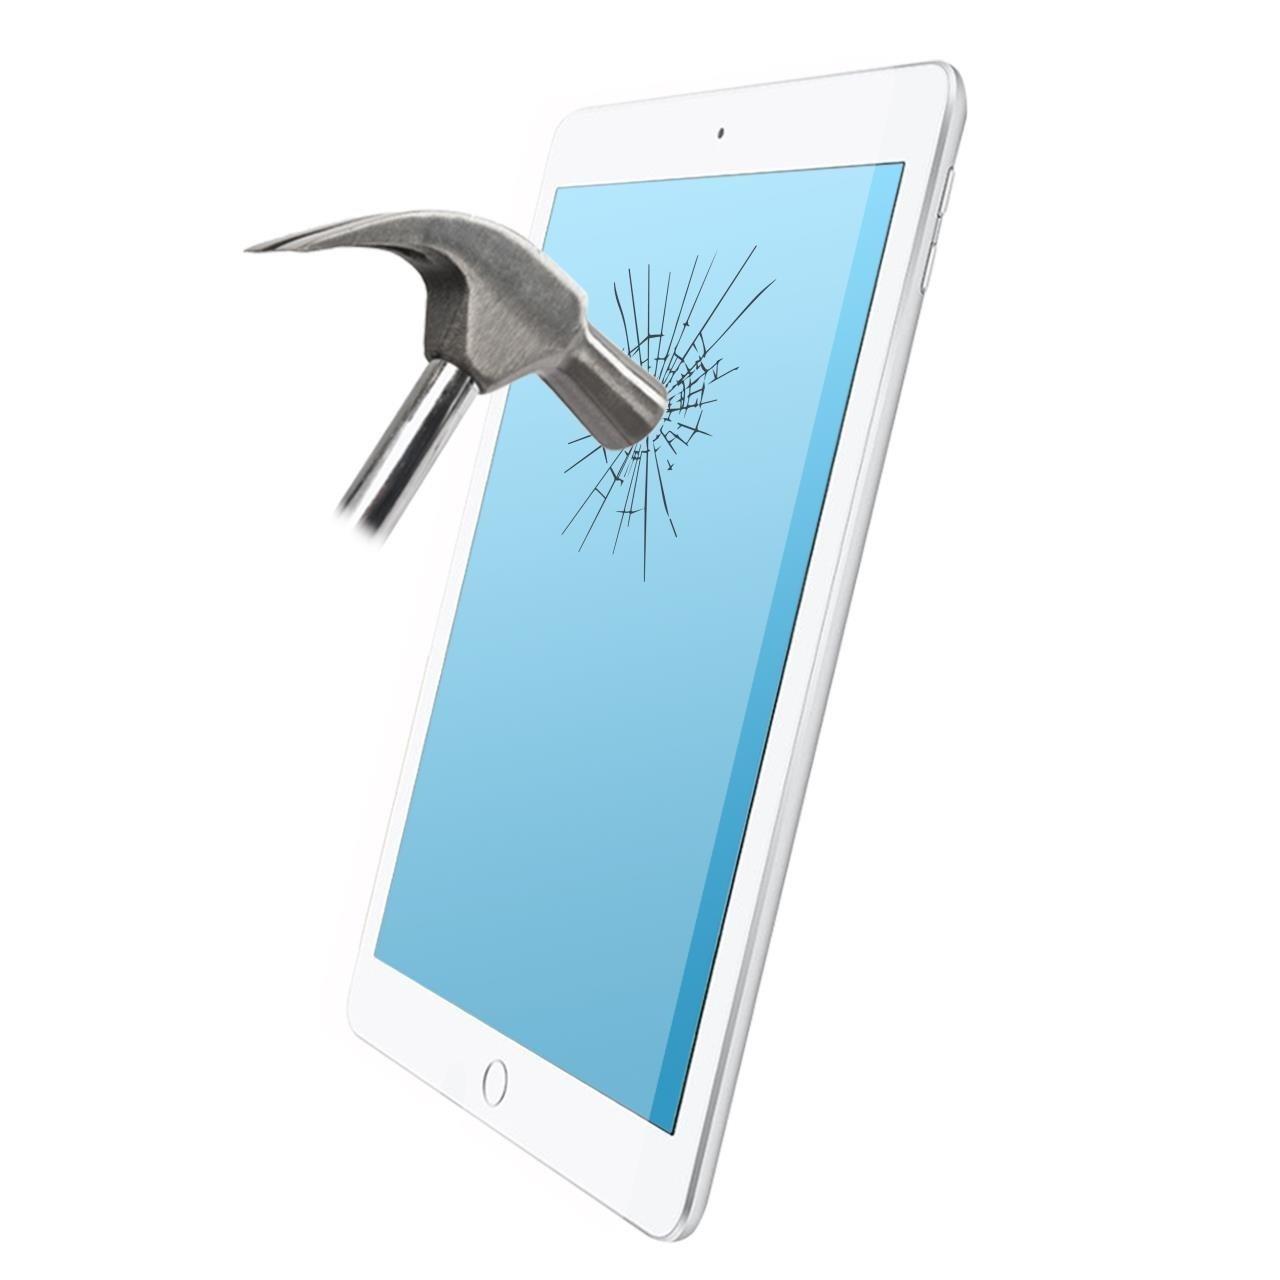 Vetro Temperato iPad Pro 10.5″ 2017 / iPad Air 10,5″ 2019-0